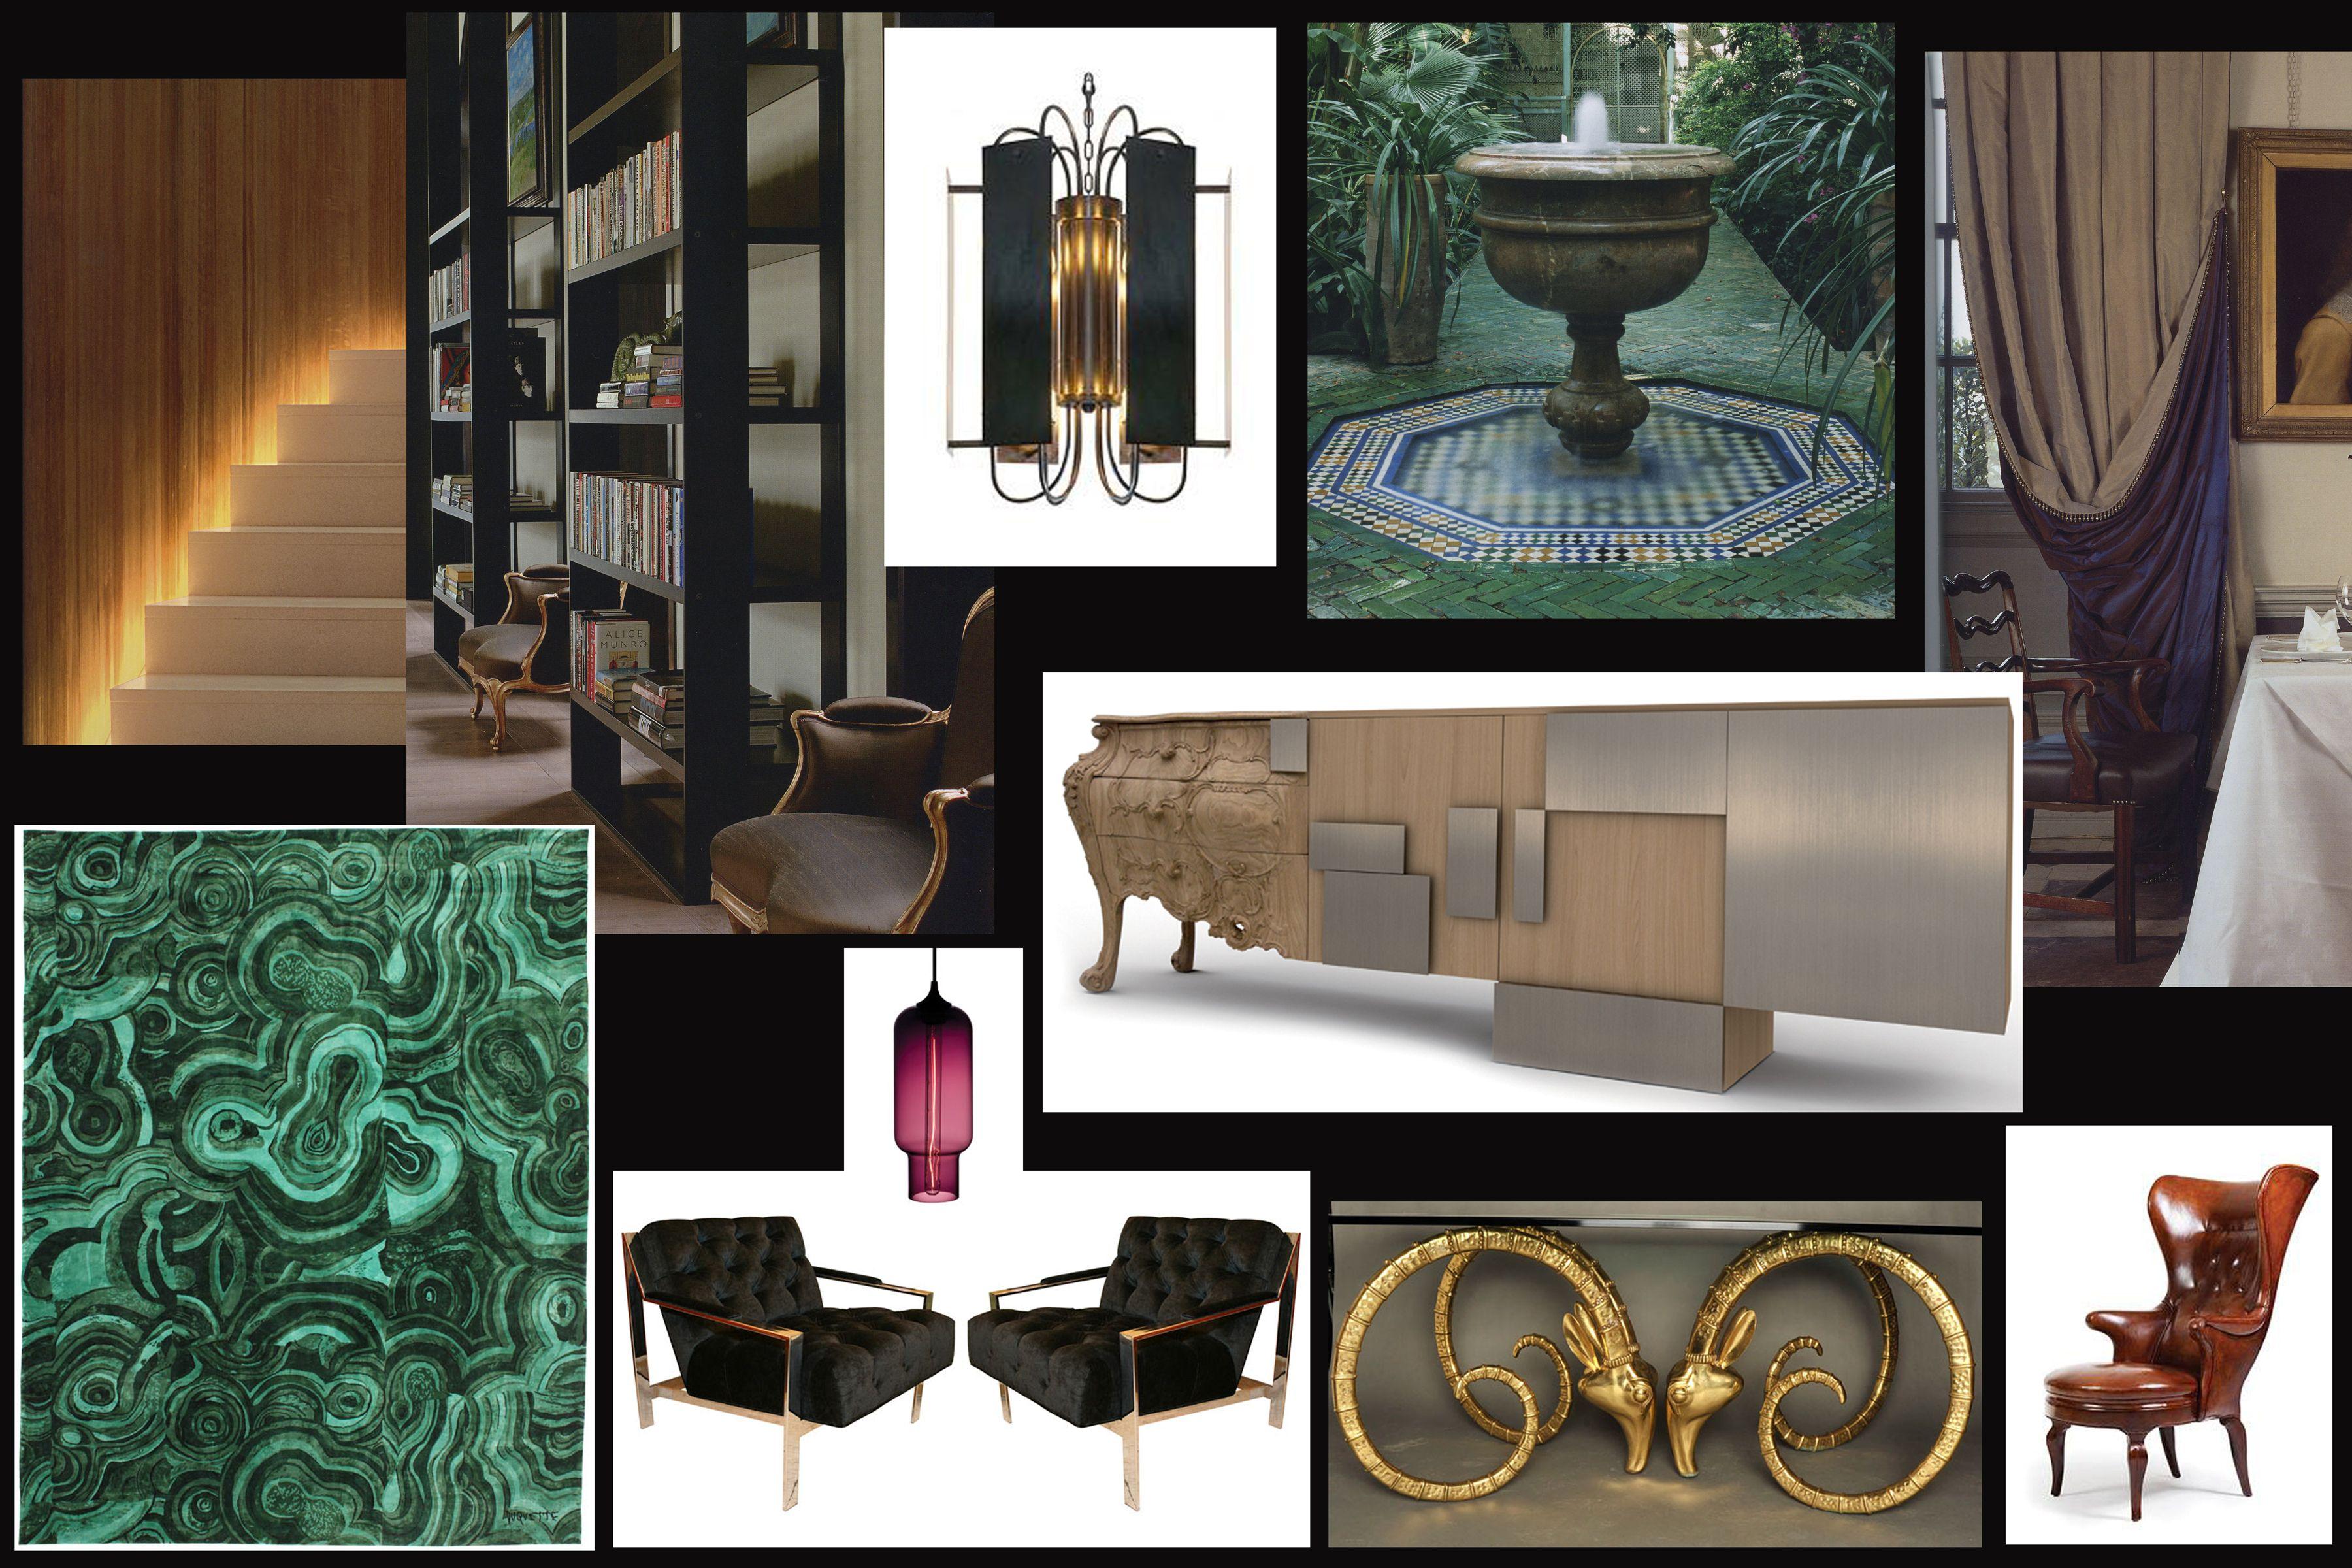 www.PrestonLeeDesign.com Hotel Lobby Concept by Preston Lee